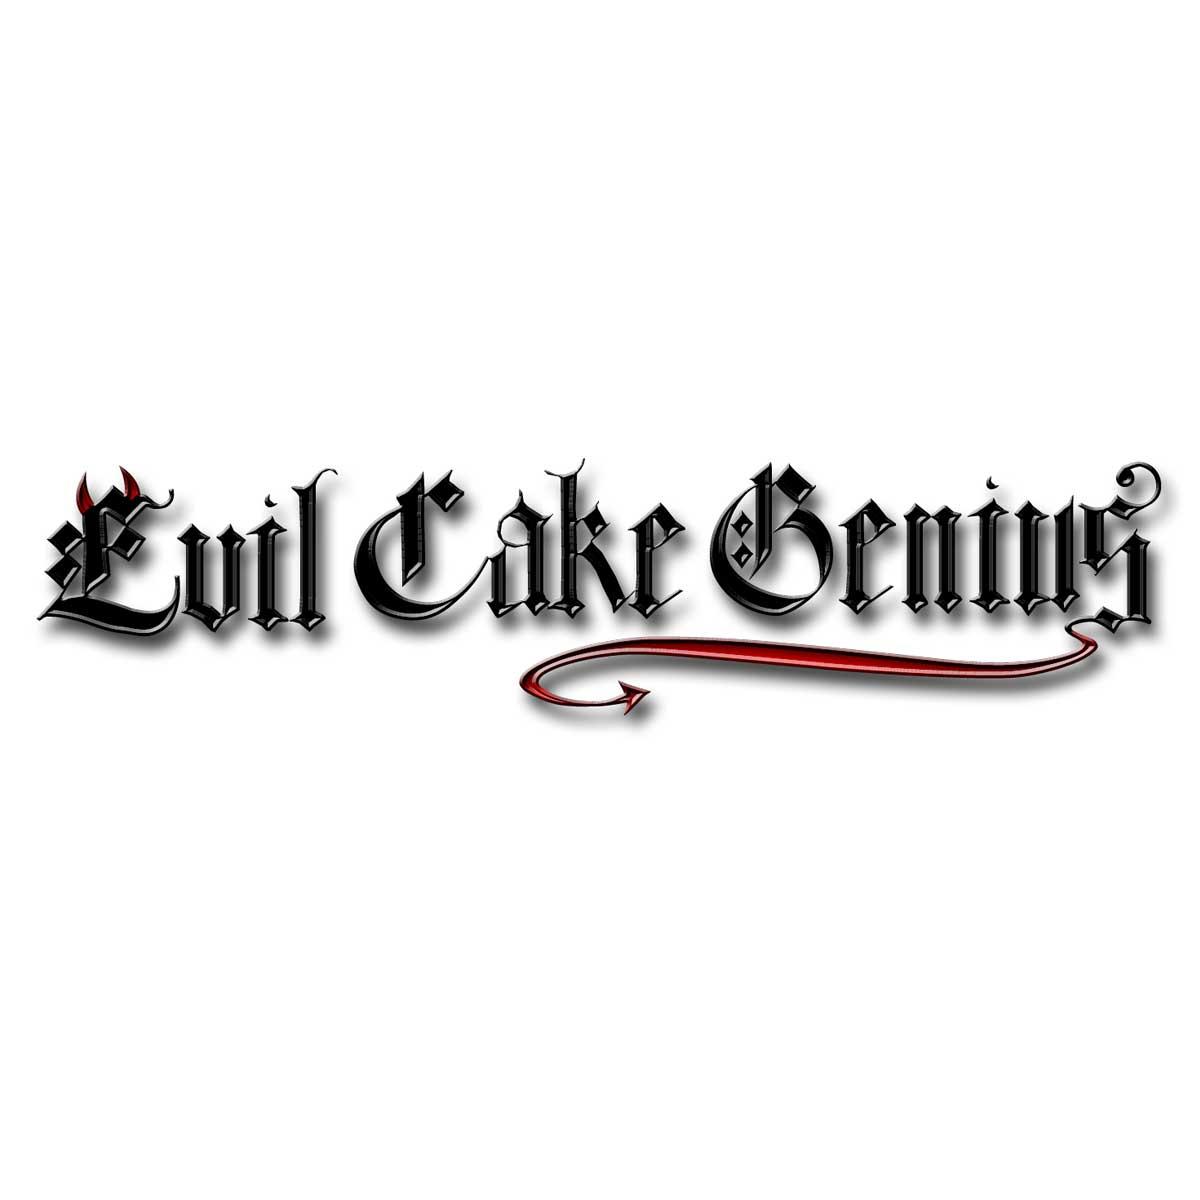 Art Nouveau Rose Vine Half Evil Cake Genius